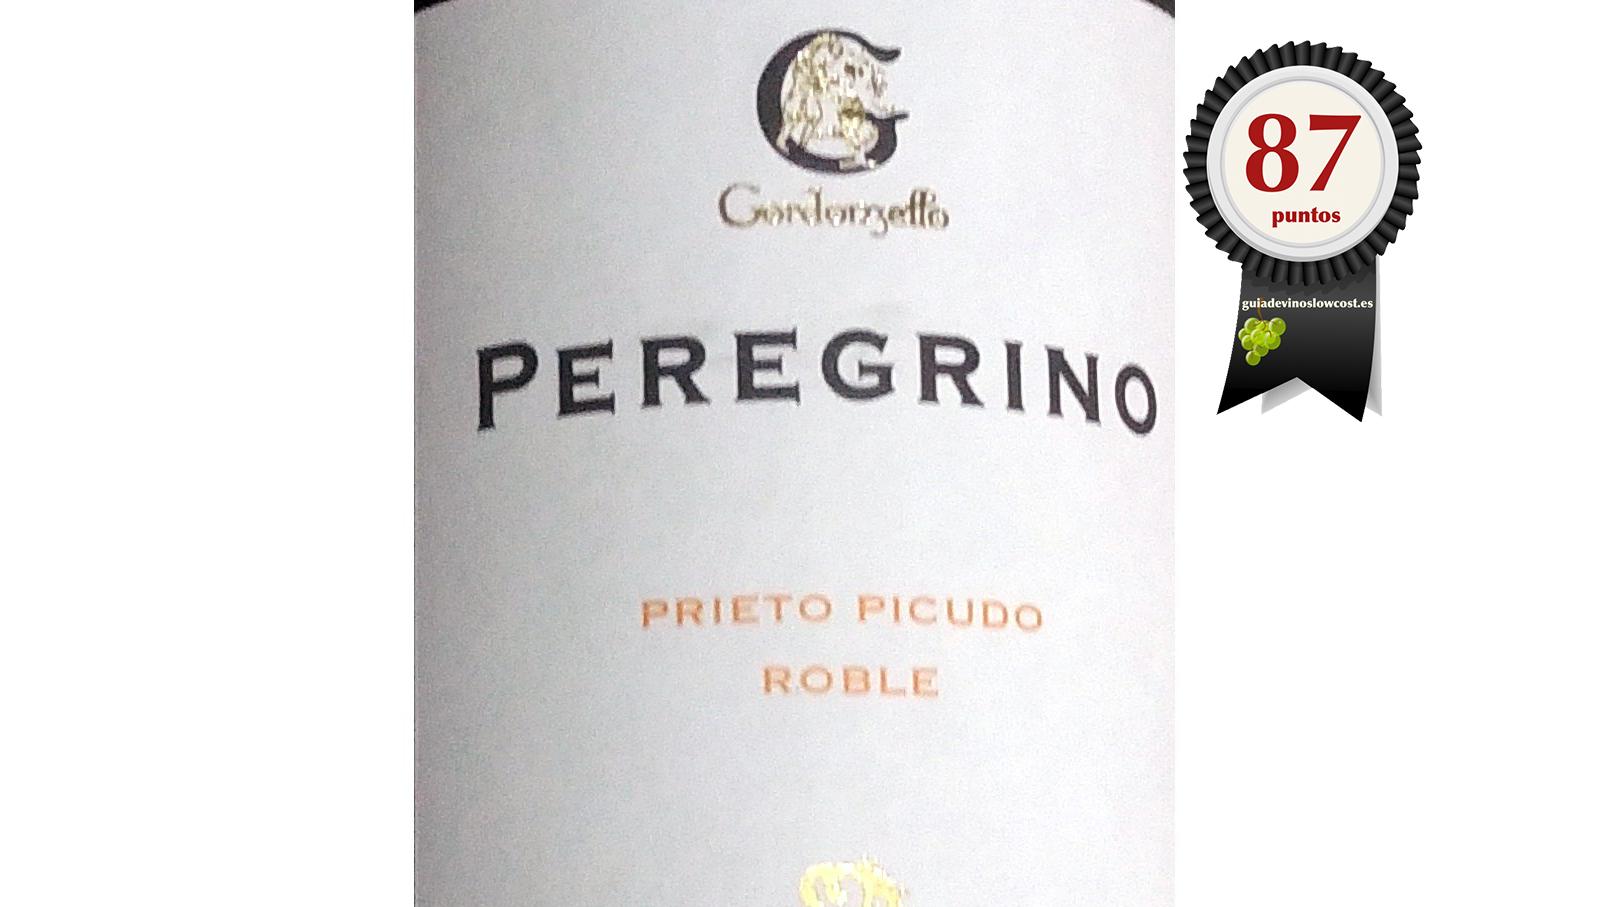 Peregrino Roble 2016